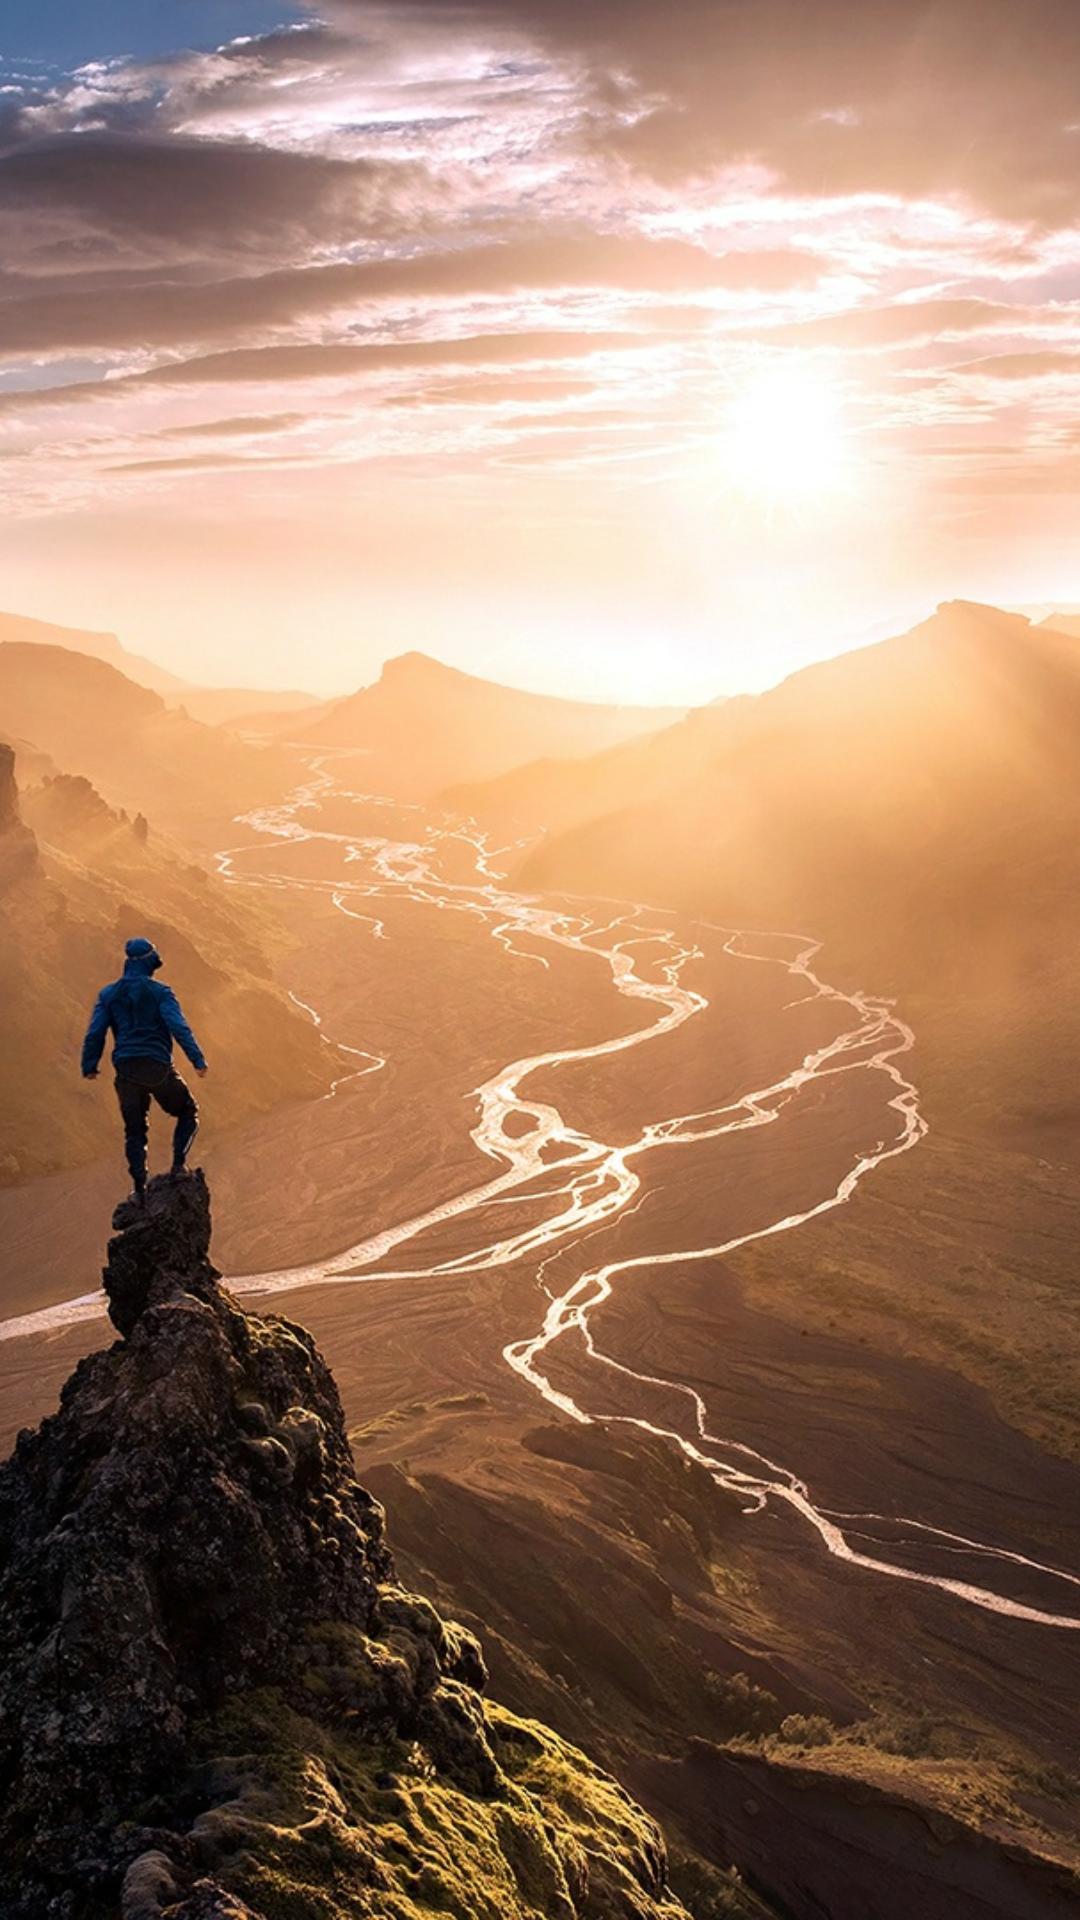 sunset landscape dawn travel mountain people daylight desert sky adventure dusk sun